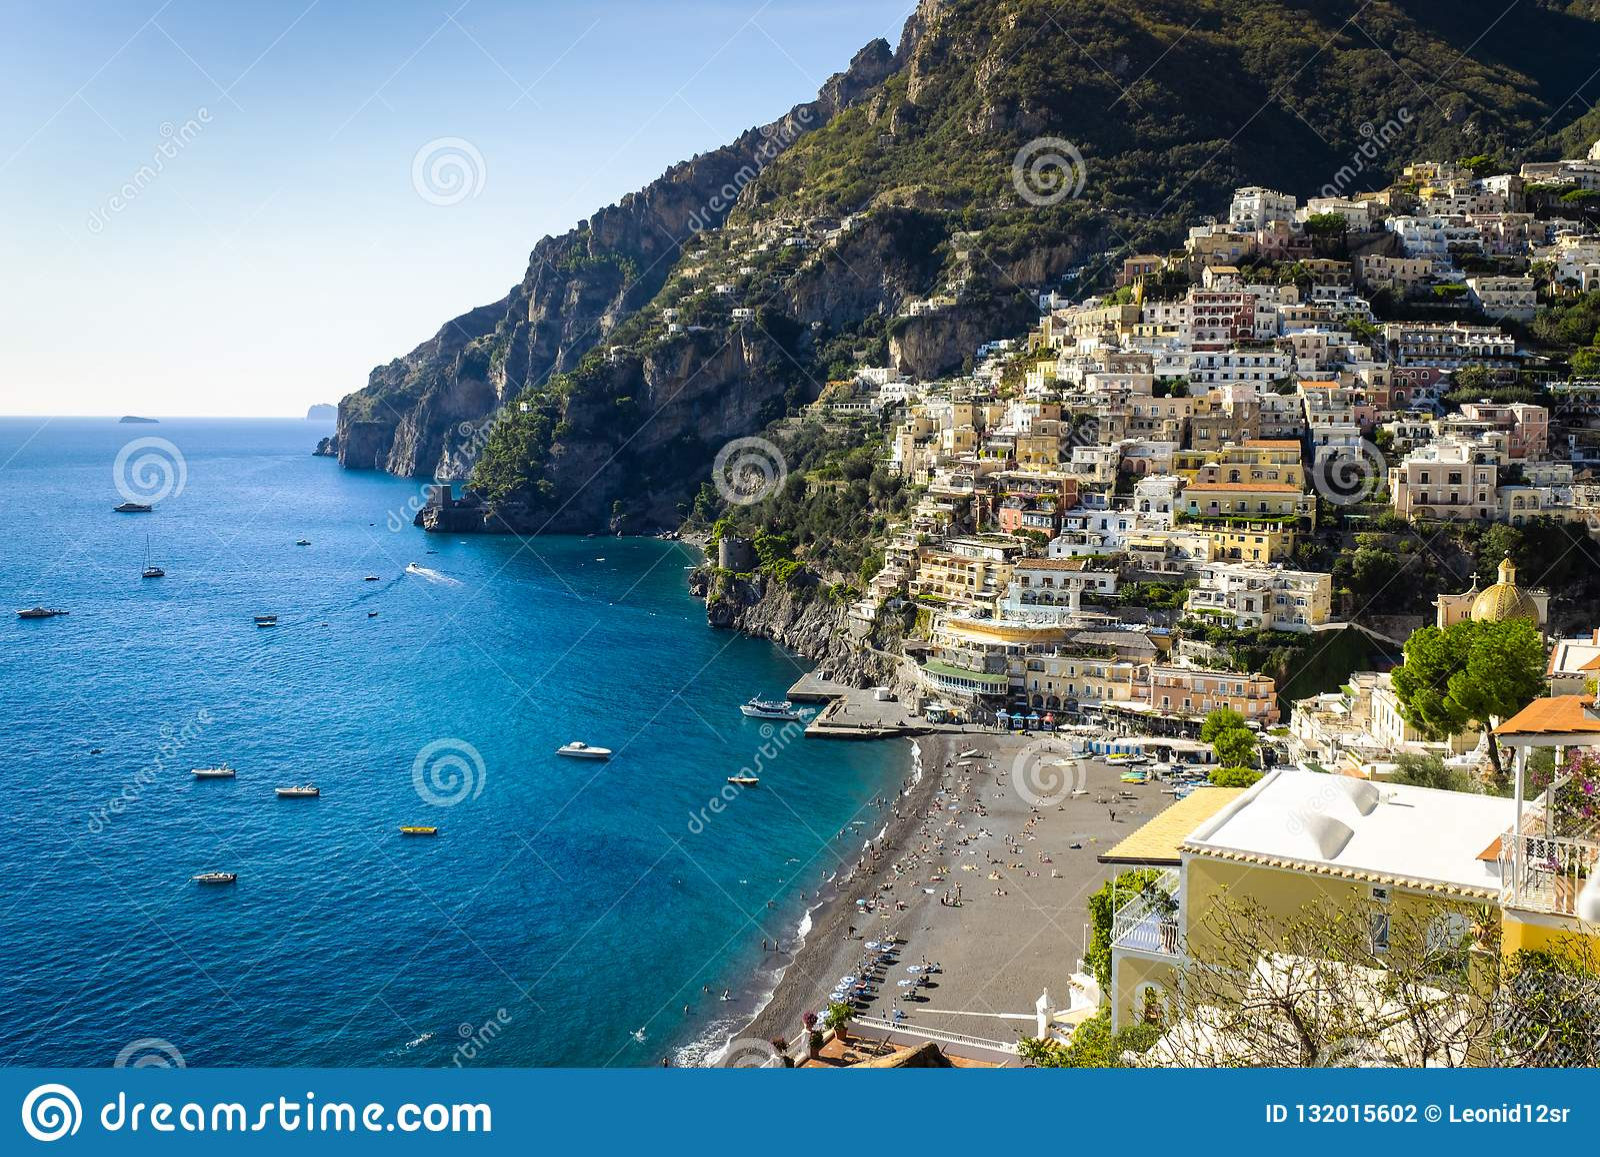 Cidades costeiras bonitas de Itália - Positano cênico na costa de Amalfi